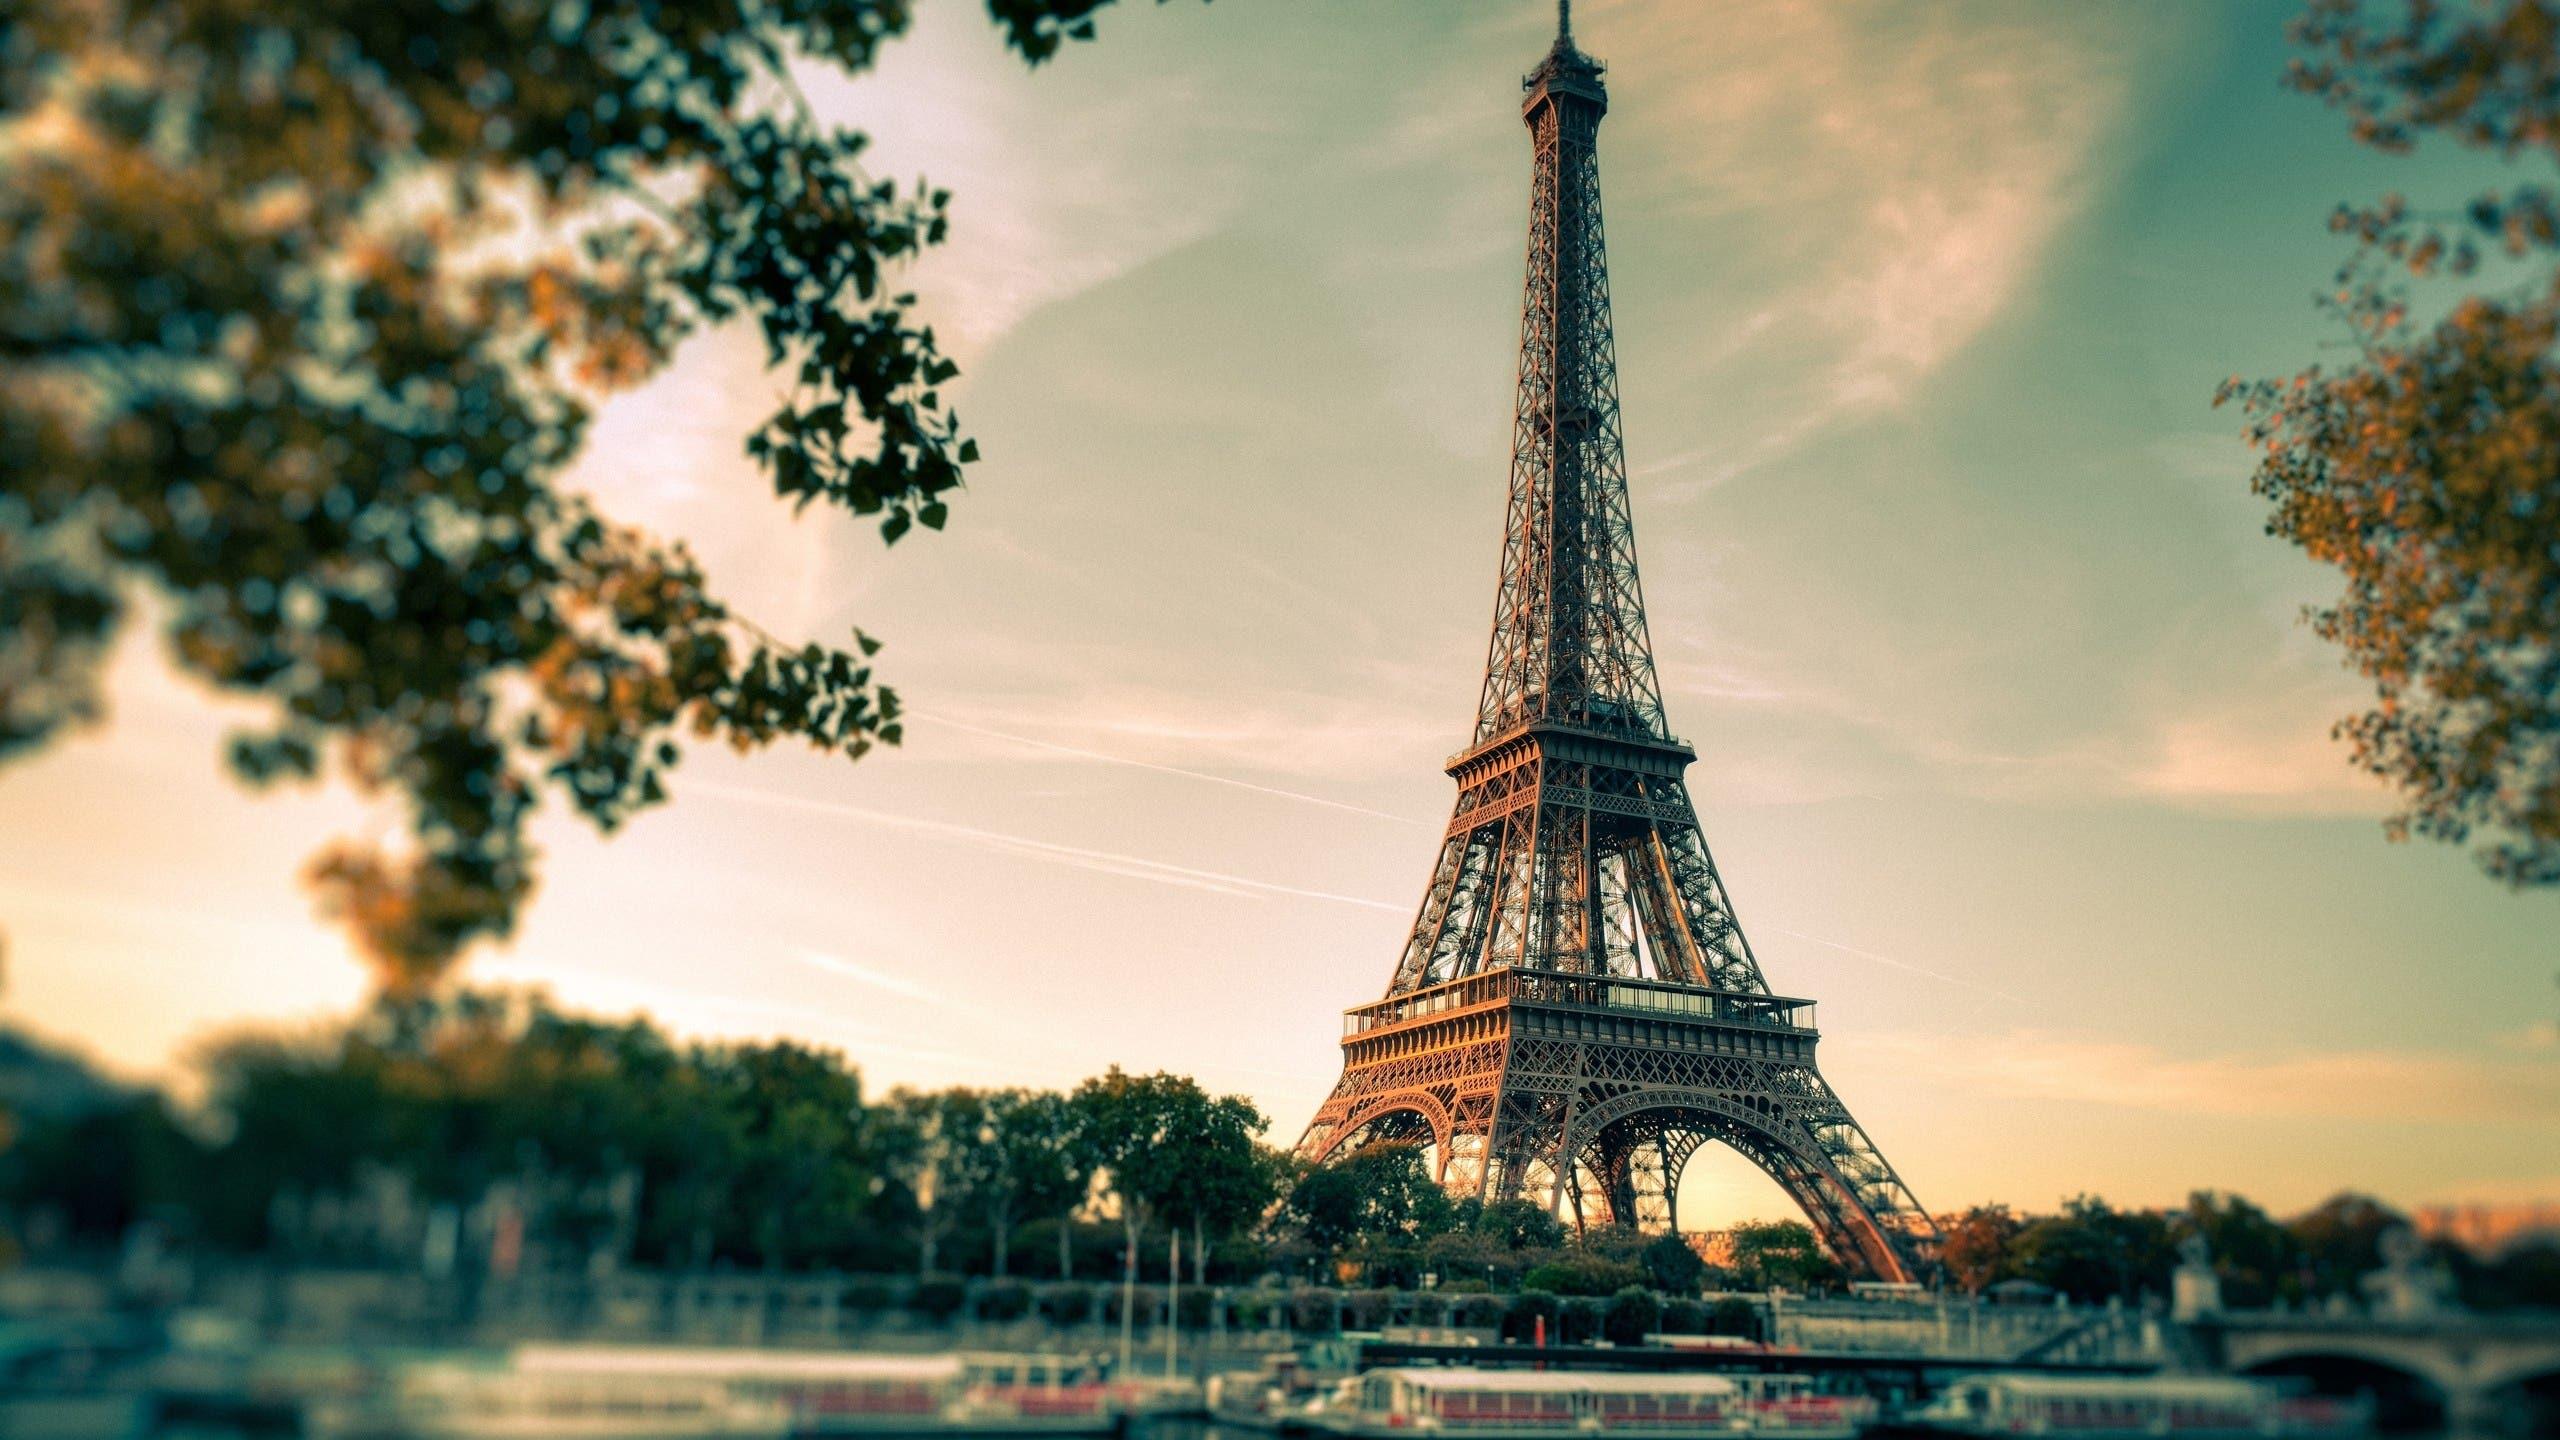 paris tower